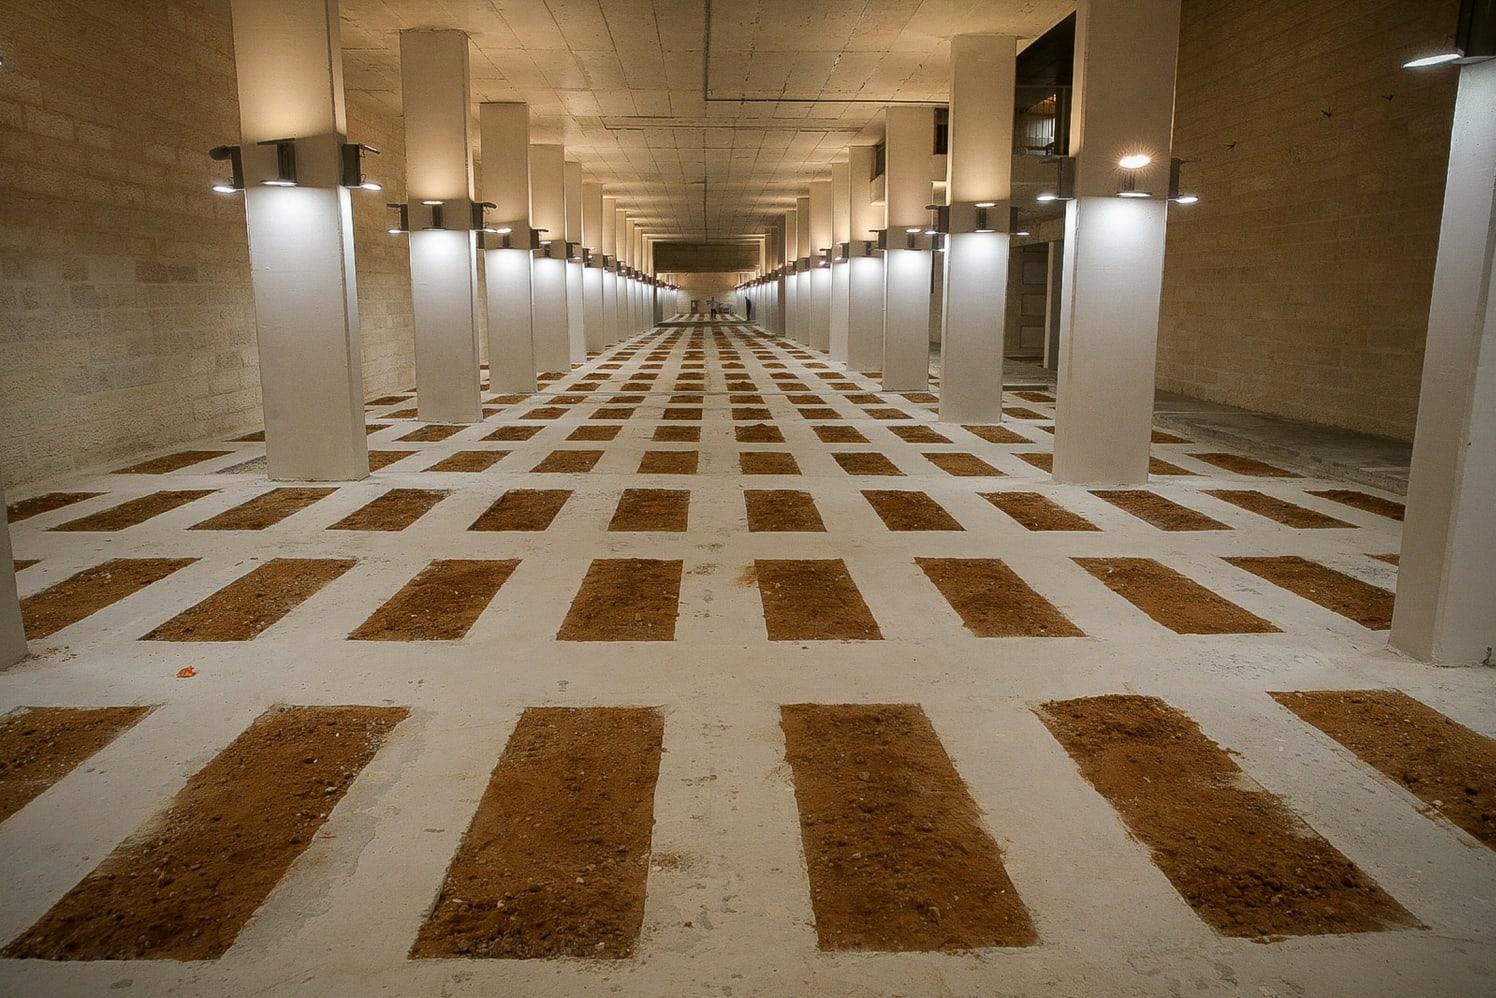 Aty ku njerëzit varrosen 16 metra nën tokë – VIDEO